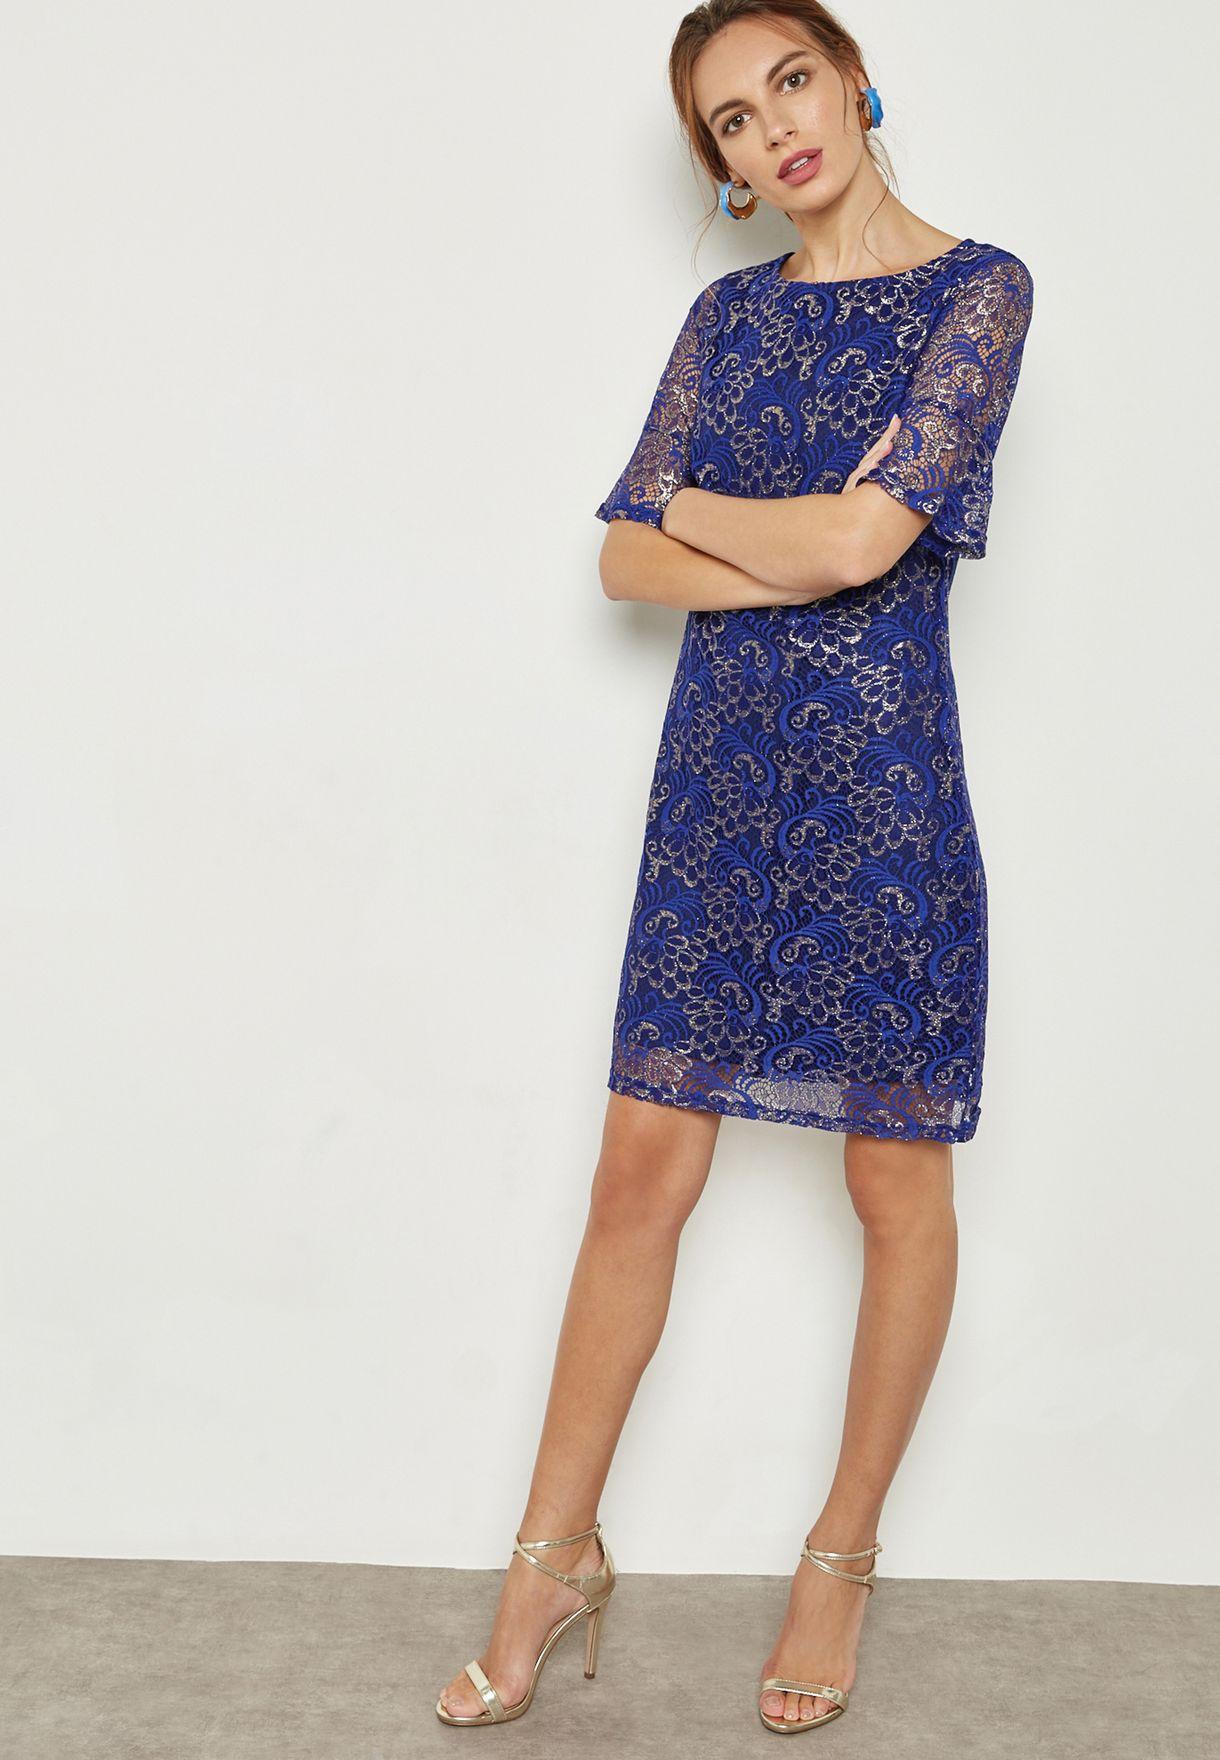 Shimmer Lace Shift Dress